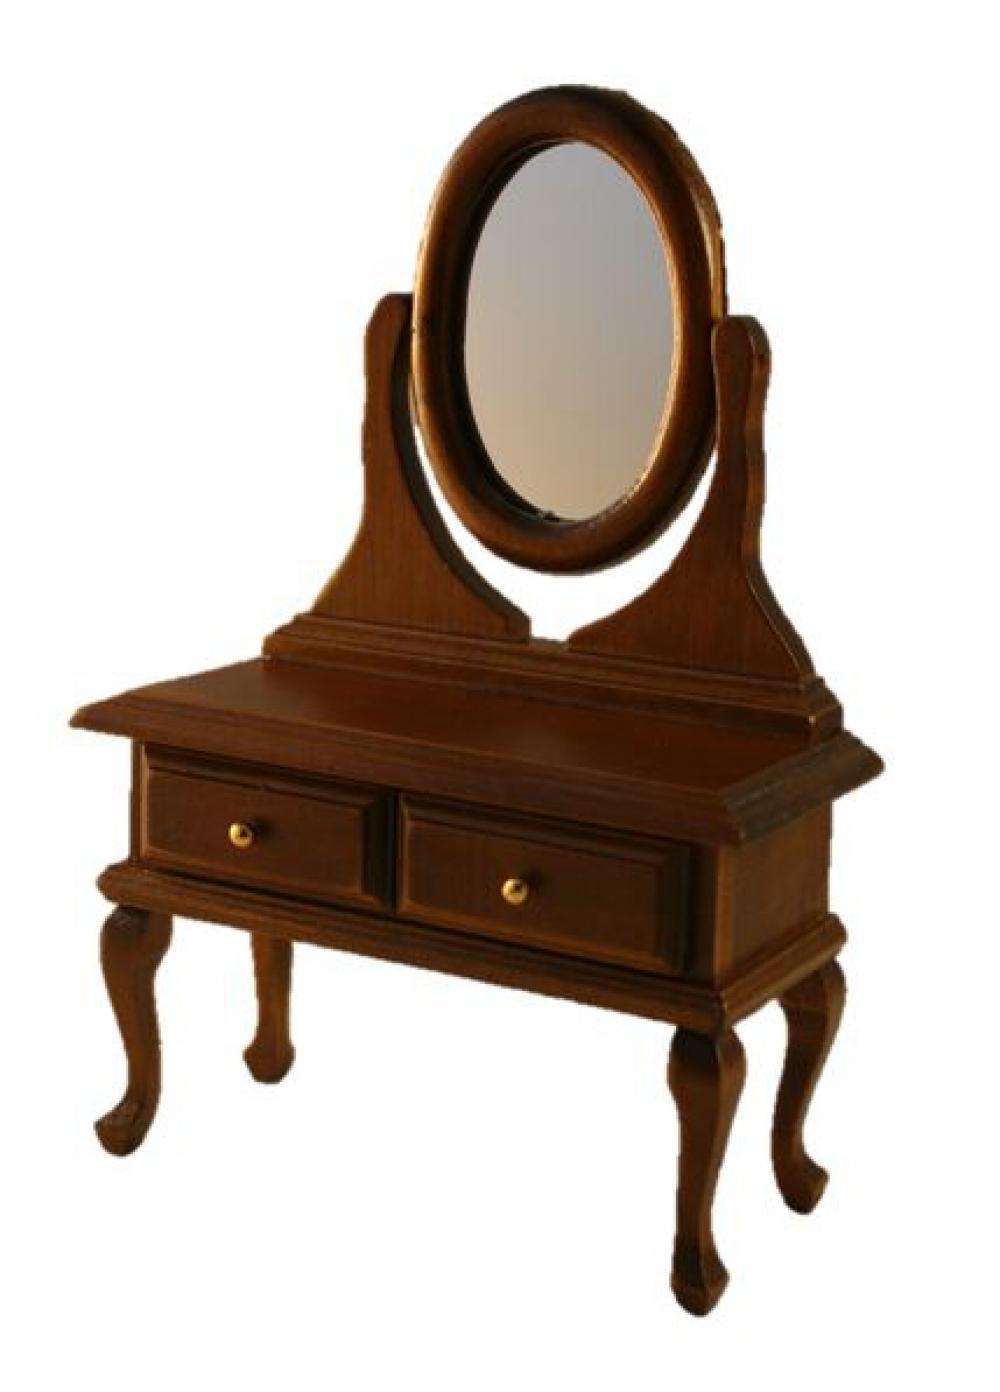 puppenstube miniatur schminktisch schminkkommode. Black Bedroom Furniture Sets. Home Design Ideas